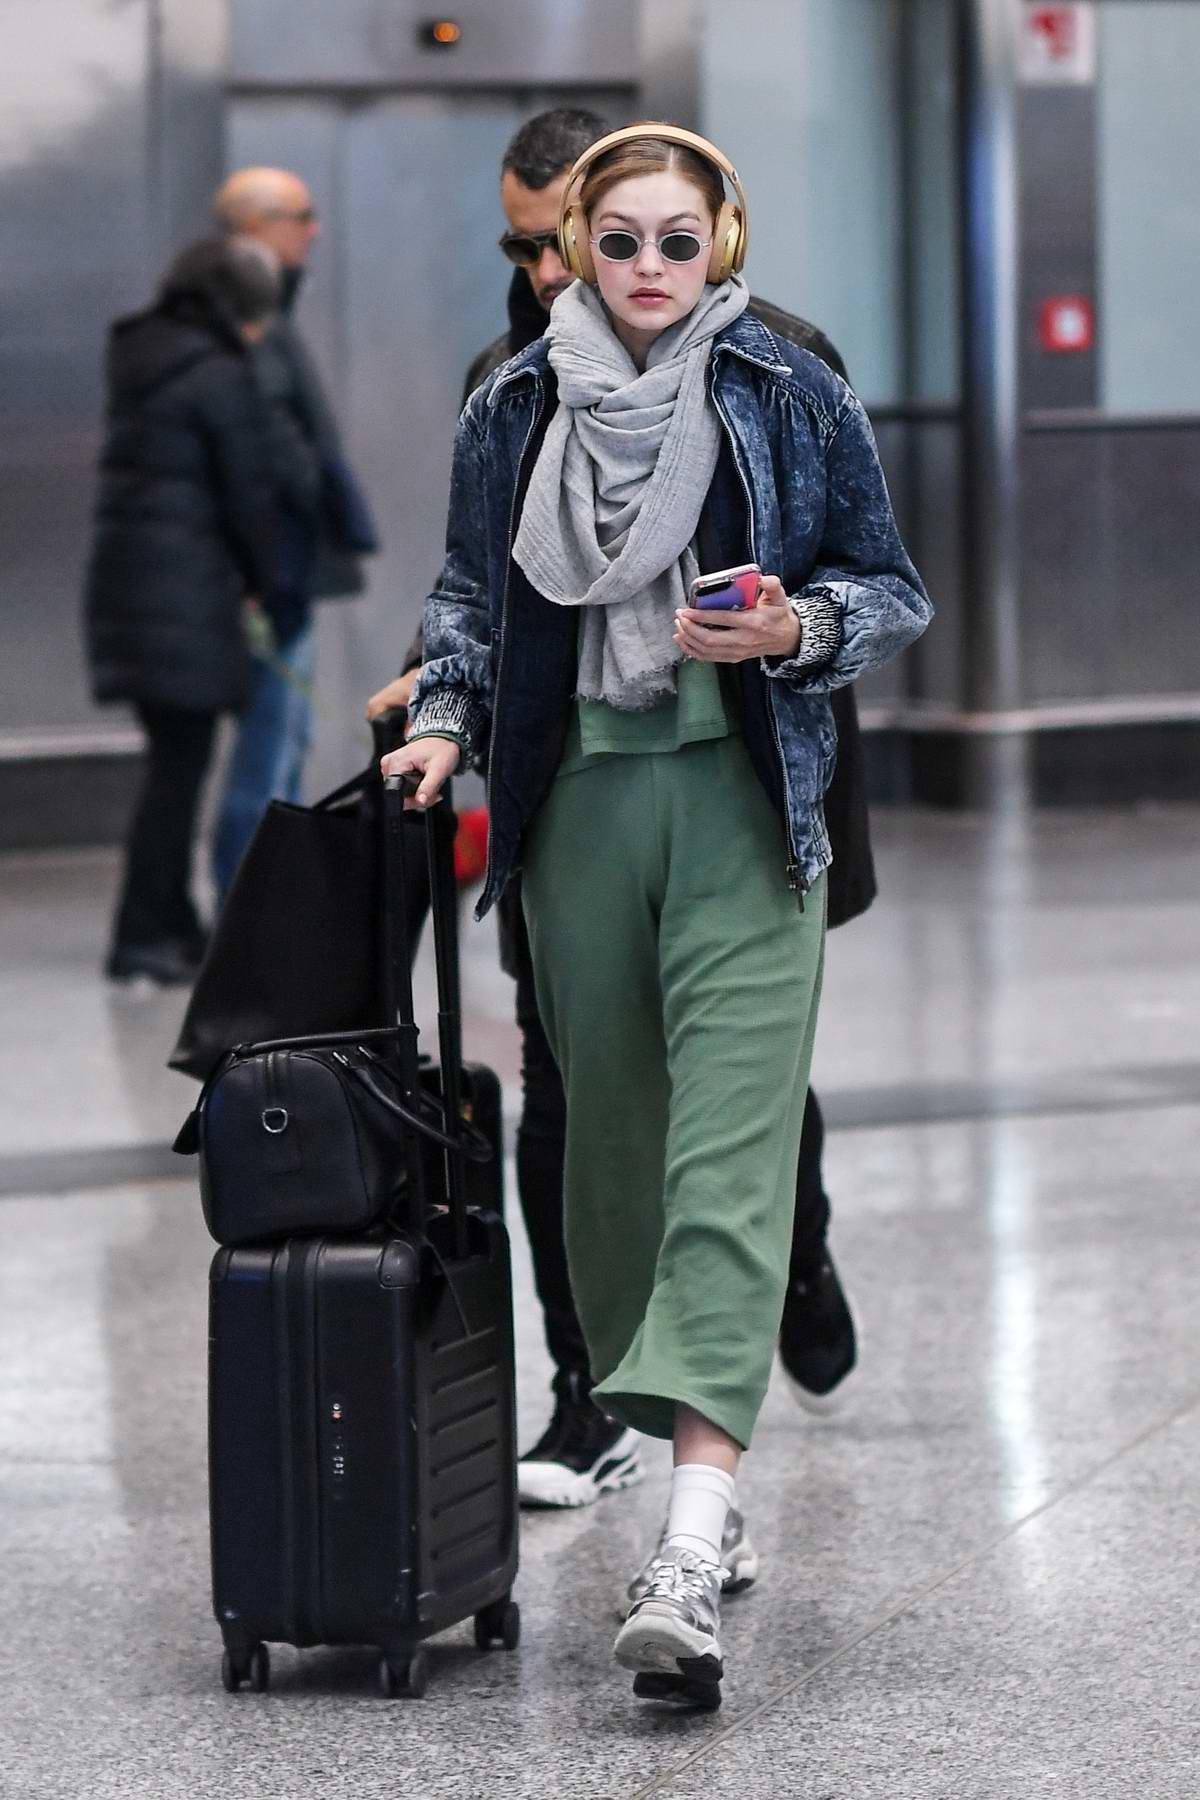 Gigi Hadid rocks her Beats headphones as she arrives at Malpensa Airport in Milan, Italy